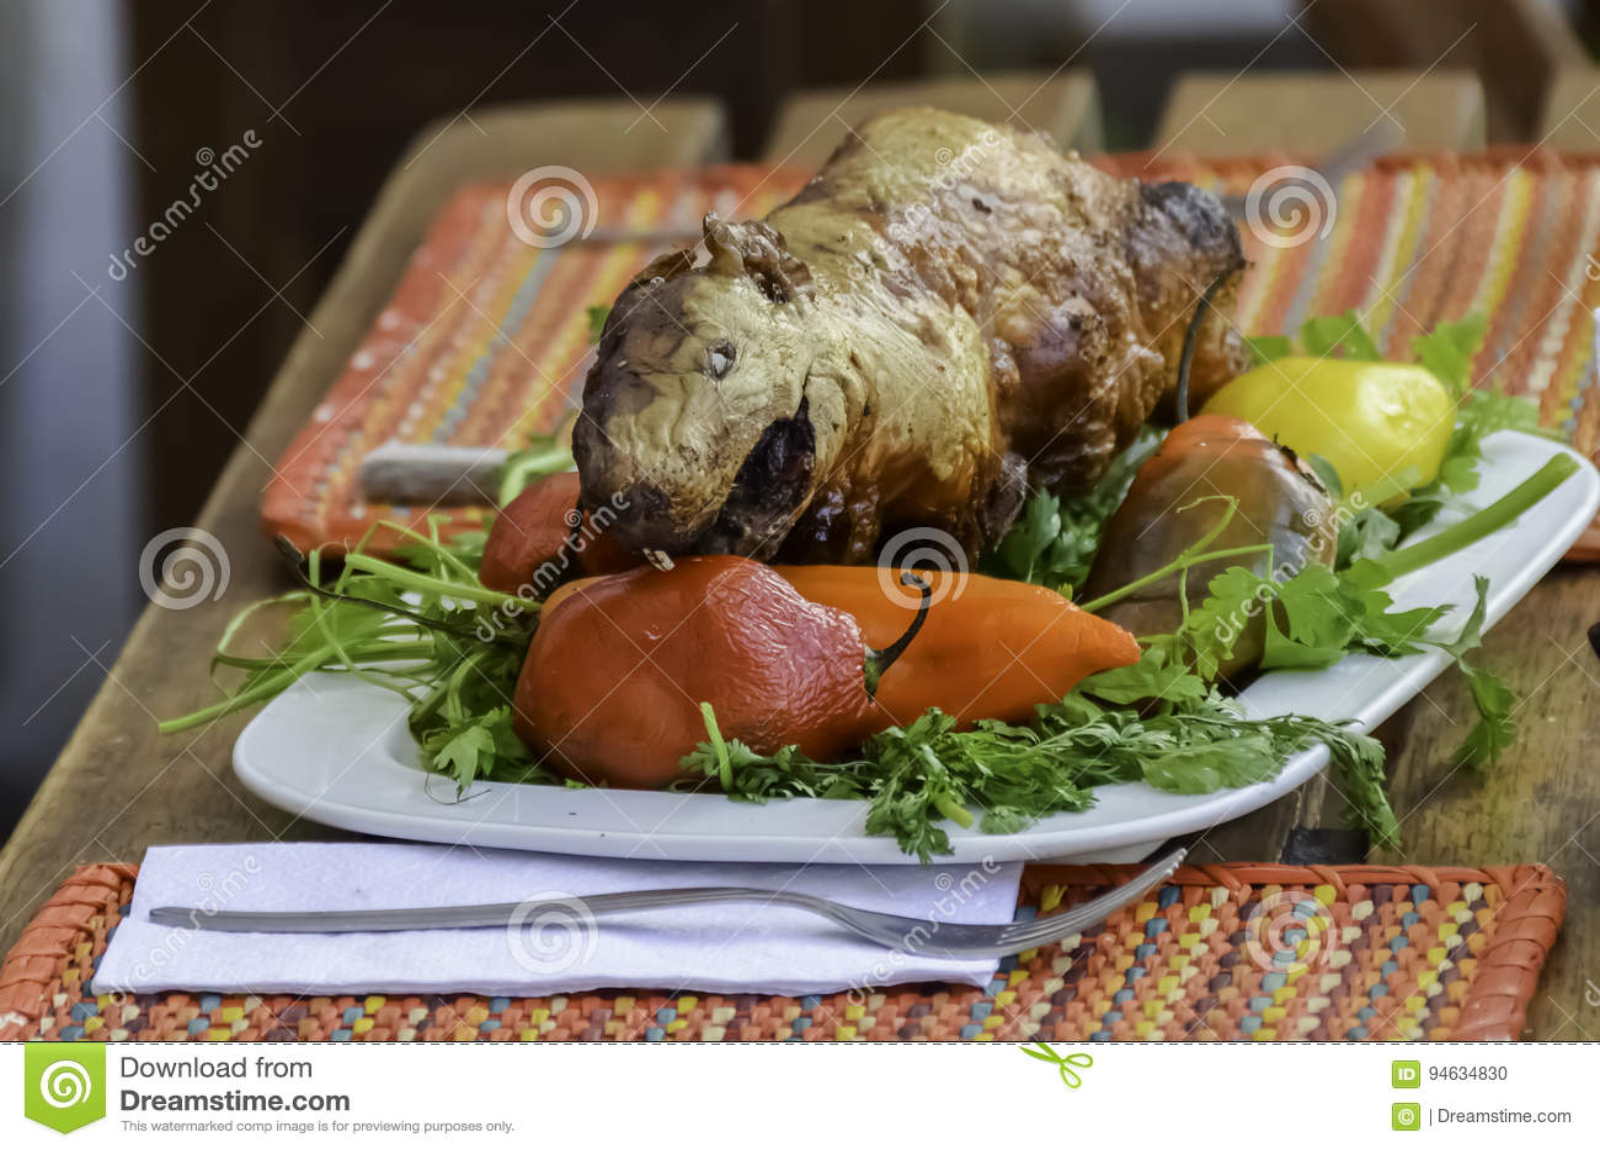 how to make roasted guinea pig